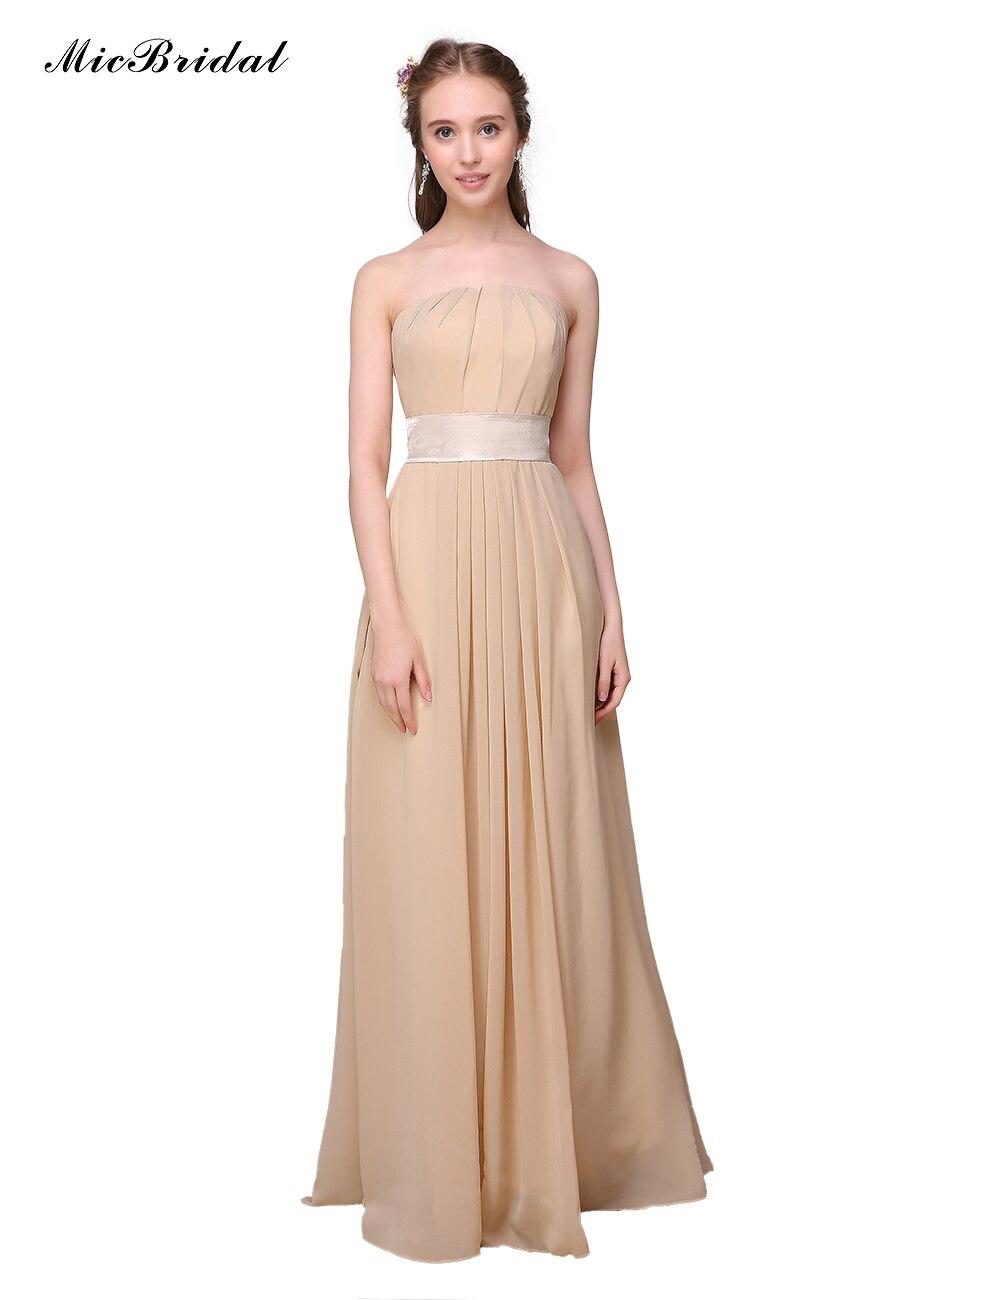 d05d65650f85 MicBridal Strapless Long Chiffon Champagne Bridesmaid Dresses 2016 Vestido  Madrinha MZ 057 Simple Wedding Guest Dresses-in Bridesmaid Dresses from  Weddings ...